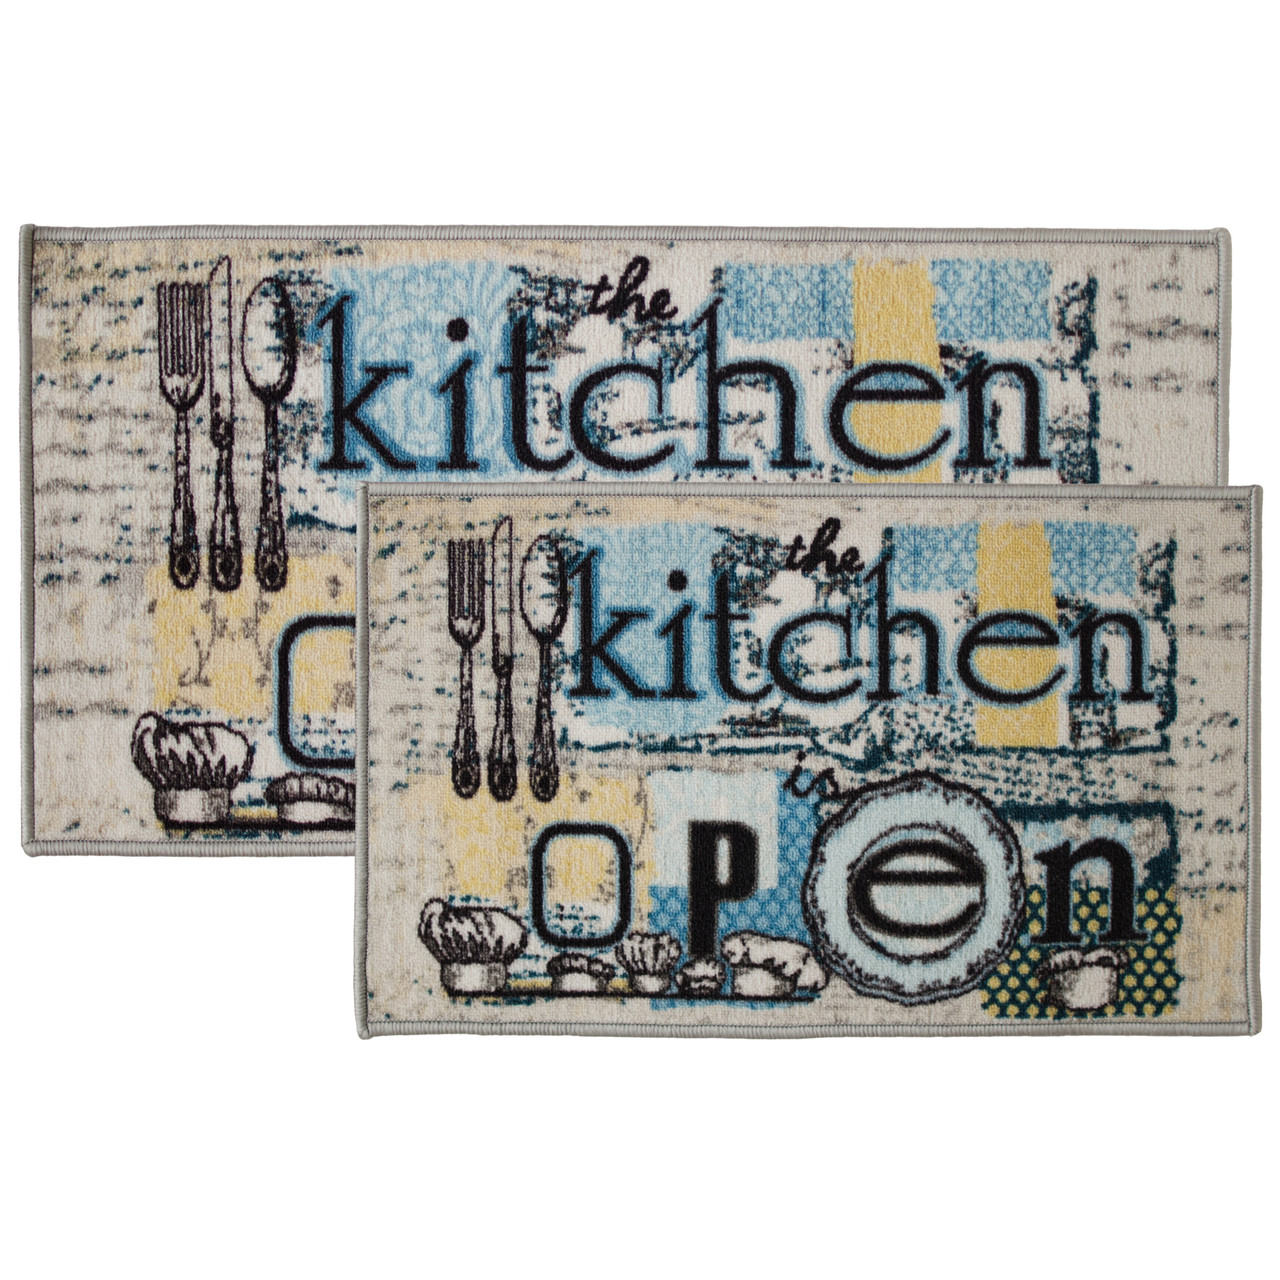 2pc Open Kitchen Kitchen Rug Set, Area Rug, Mat, Carpet, Non-Skid Latex  Back (18x30 Rectangle & 20x40)